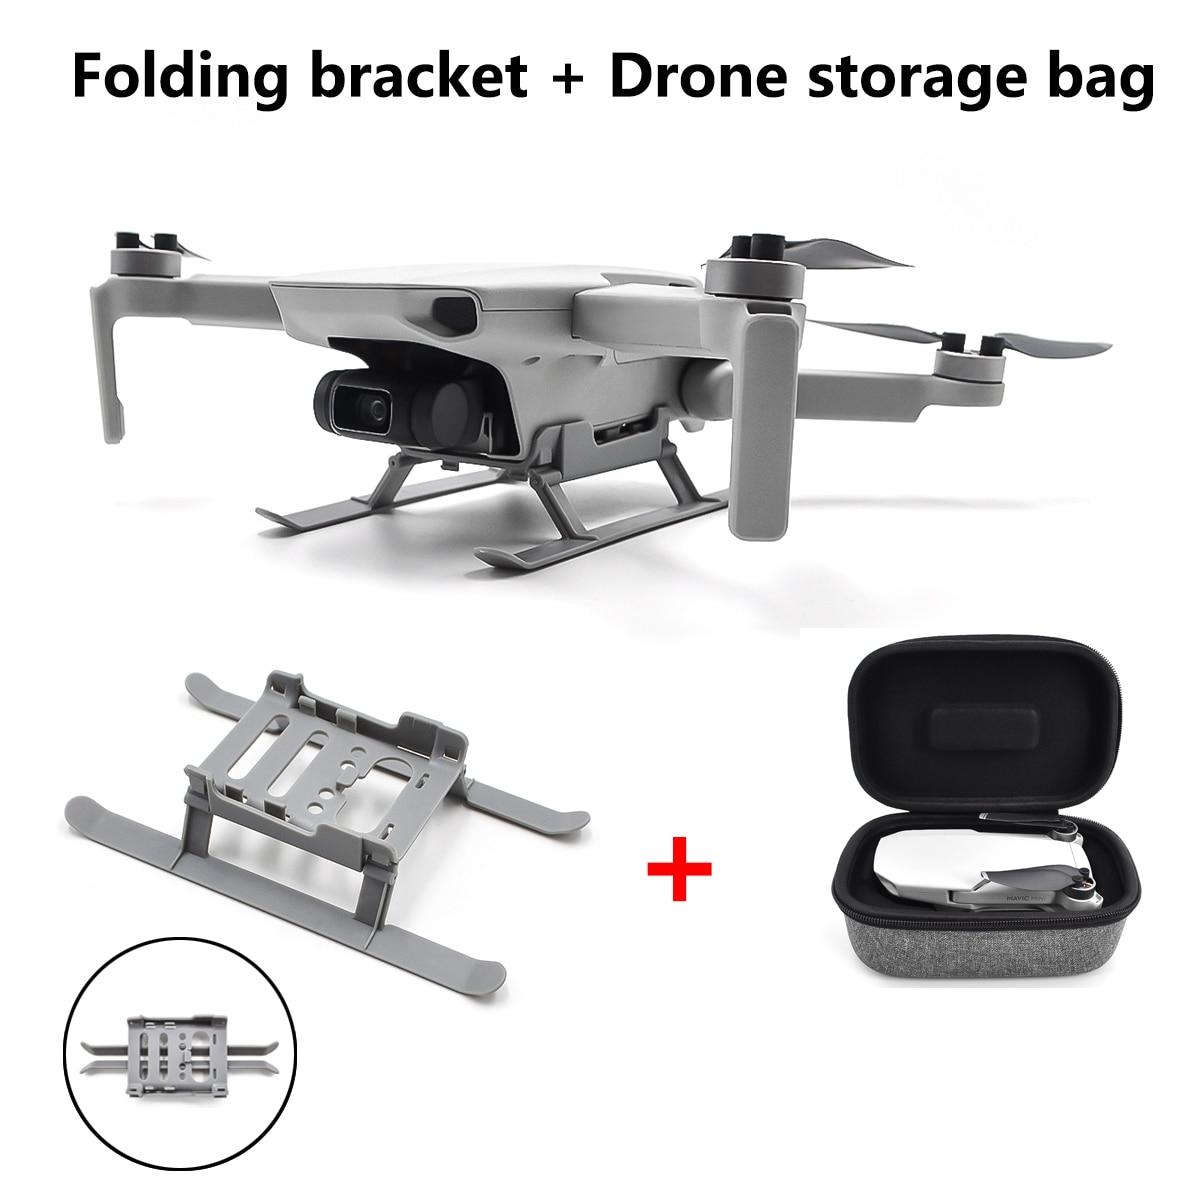 STARTRC Mavic mini heightened Anti-drop bracket /landing gear /extension bracket with drone storage